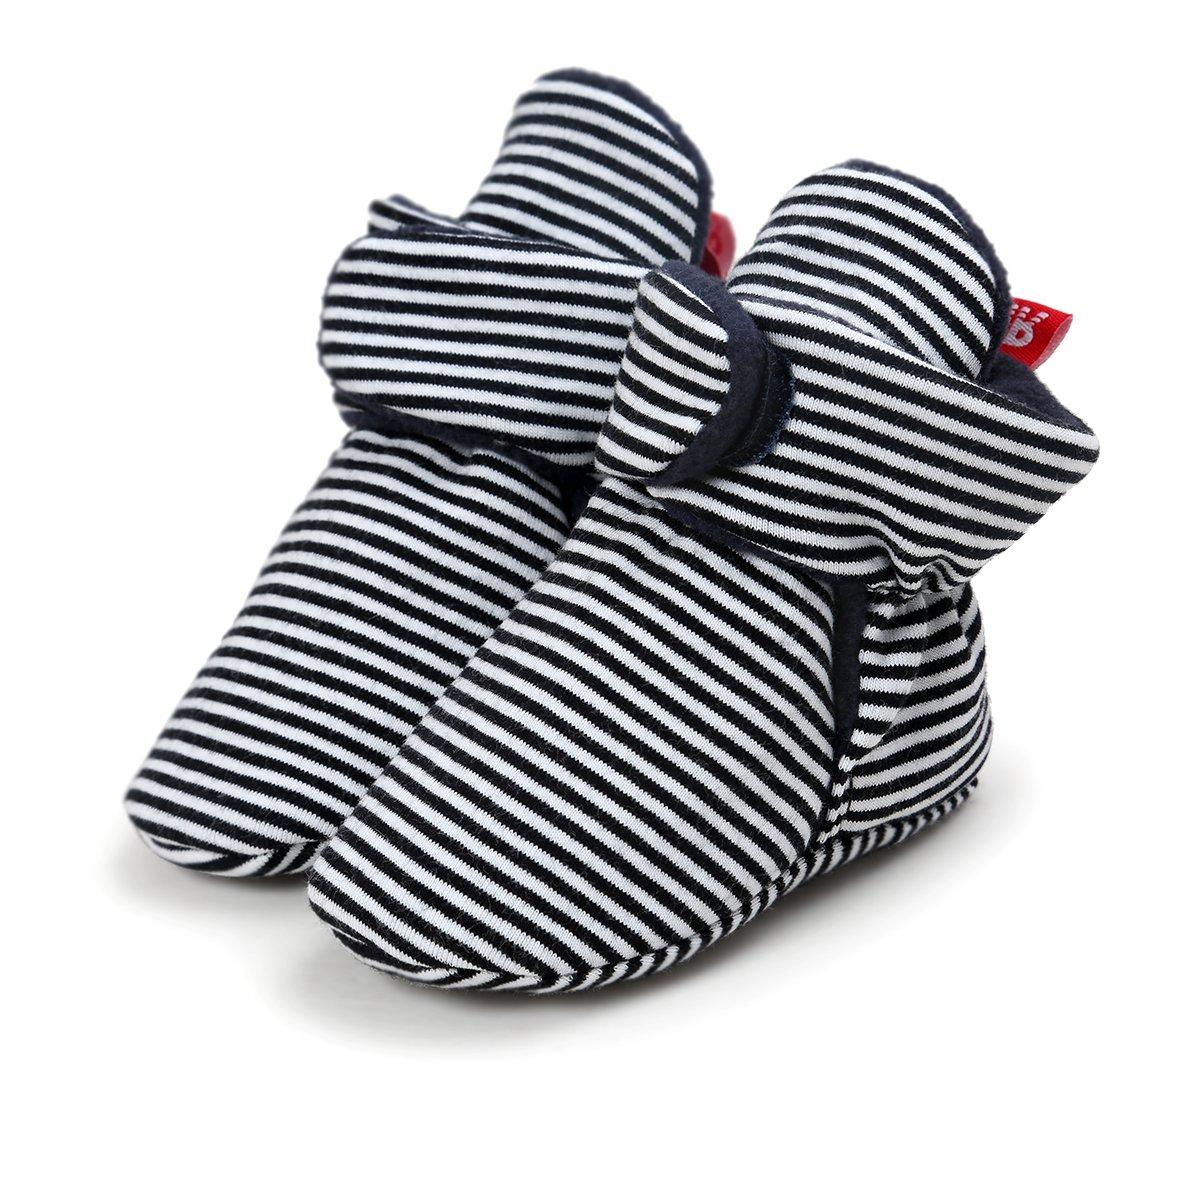 Fleece Booties Non Skid Bottom Unisex for Baby Boys Or Baby Girls